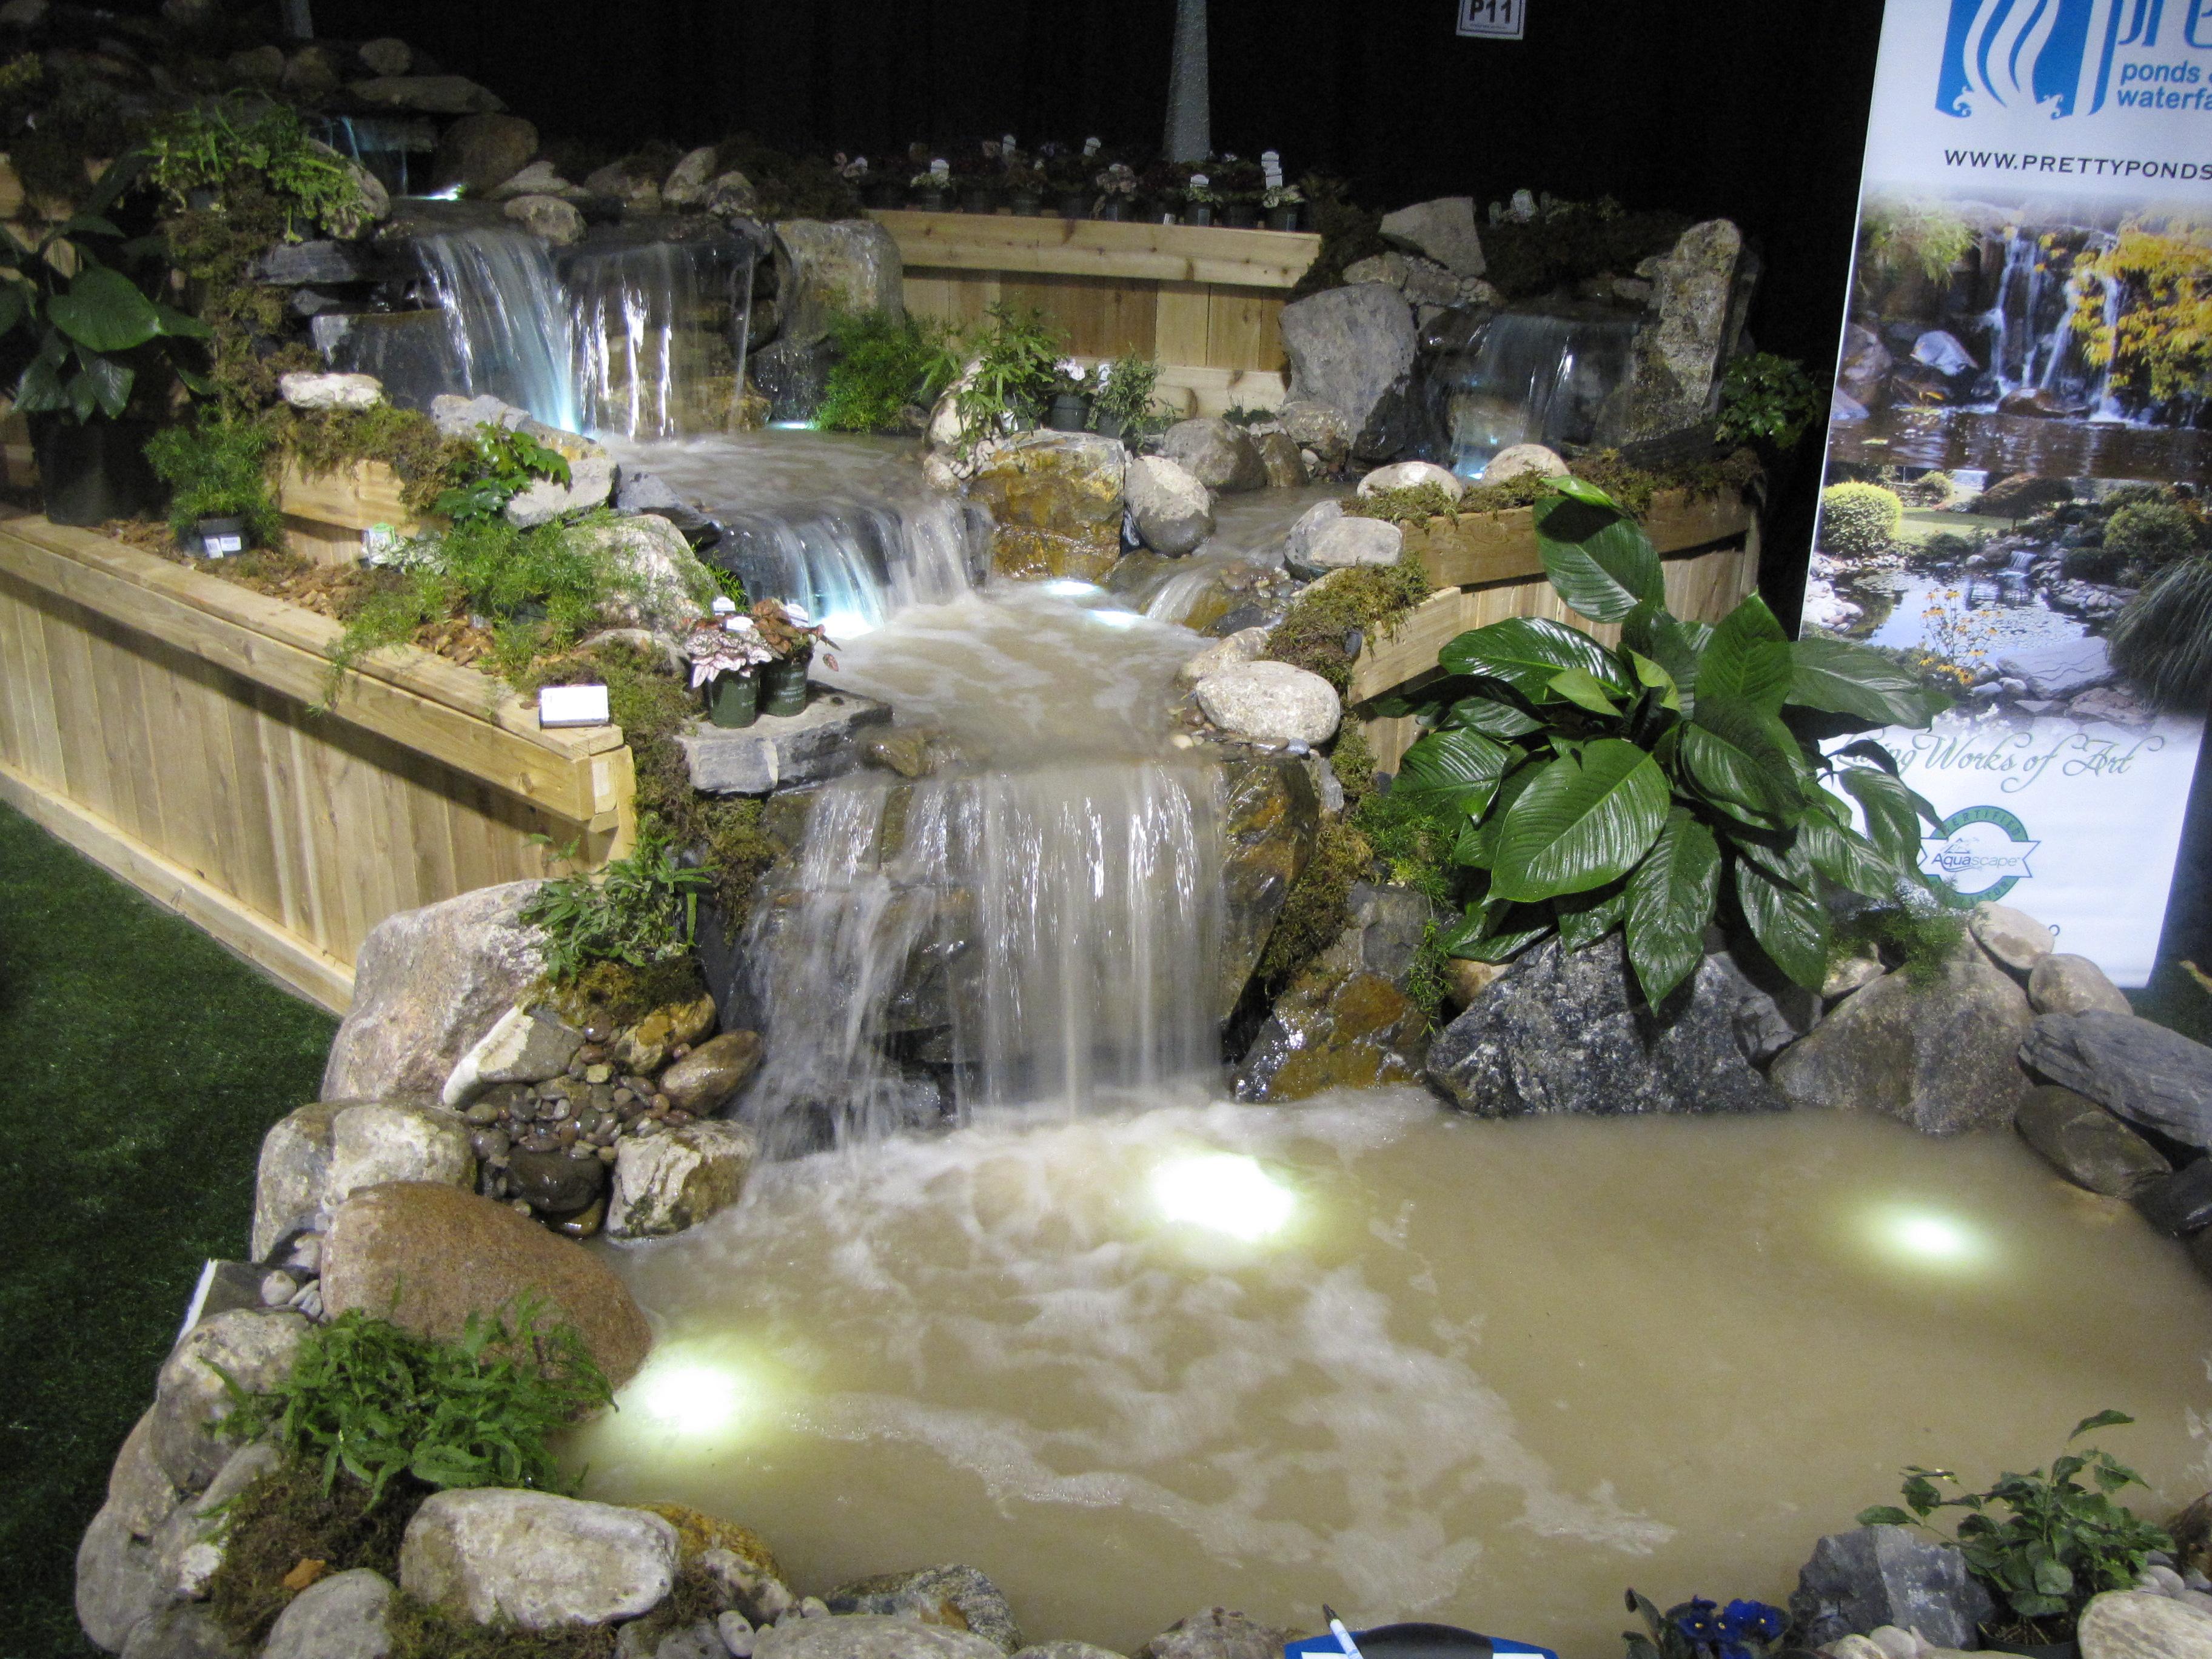 Pond Log Reduces Turbidity And Phosphates Pondpro